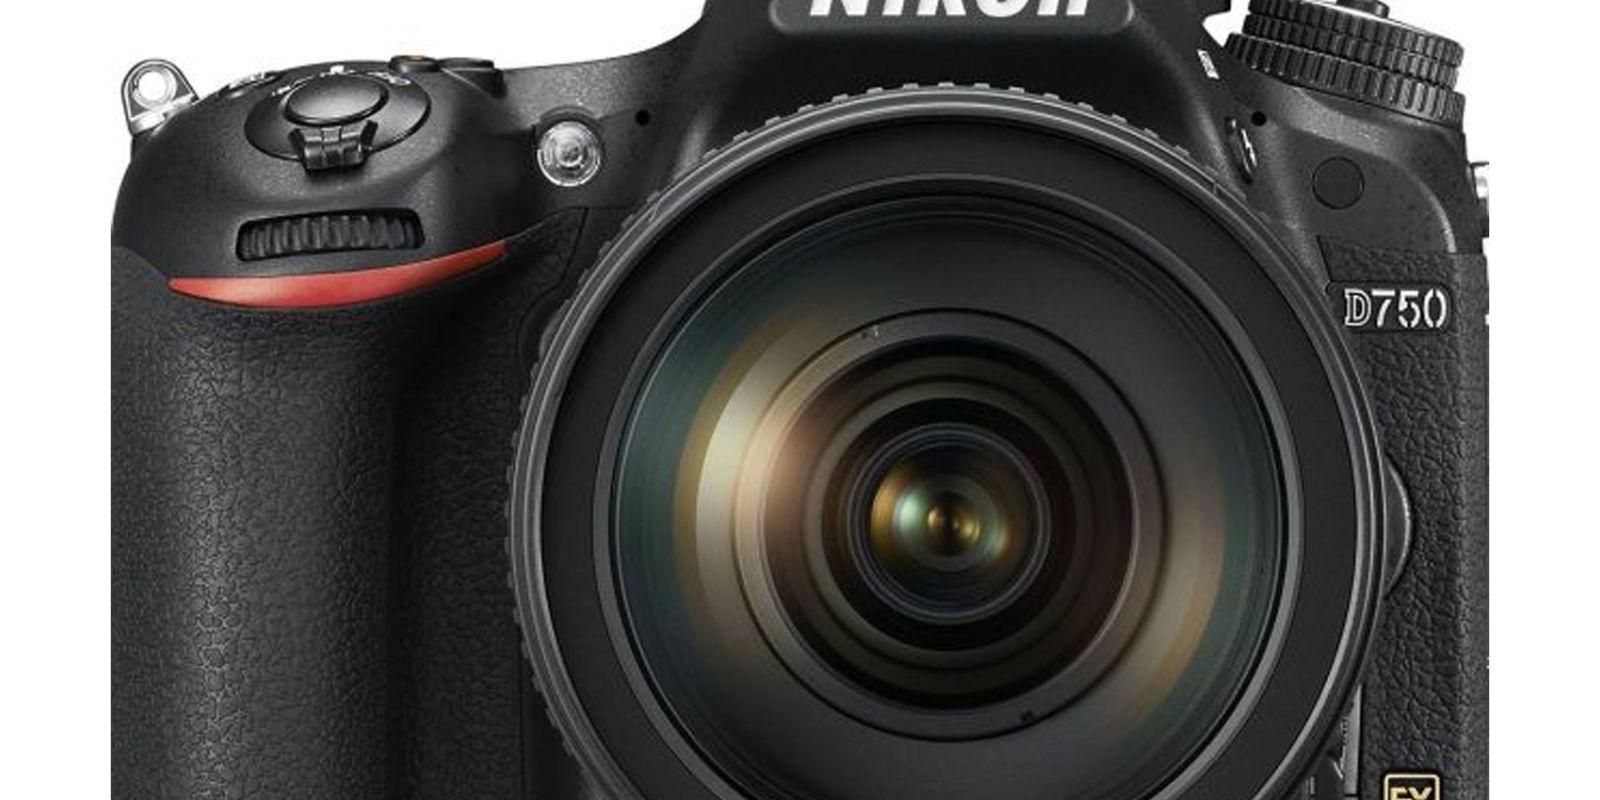 Digital Camera Reviews - Best Digital Cameras